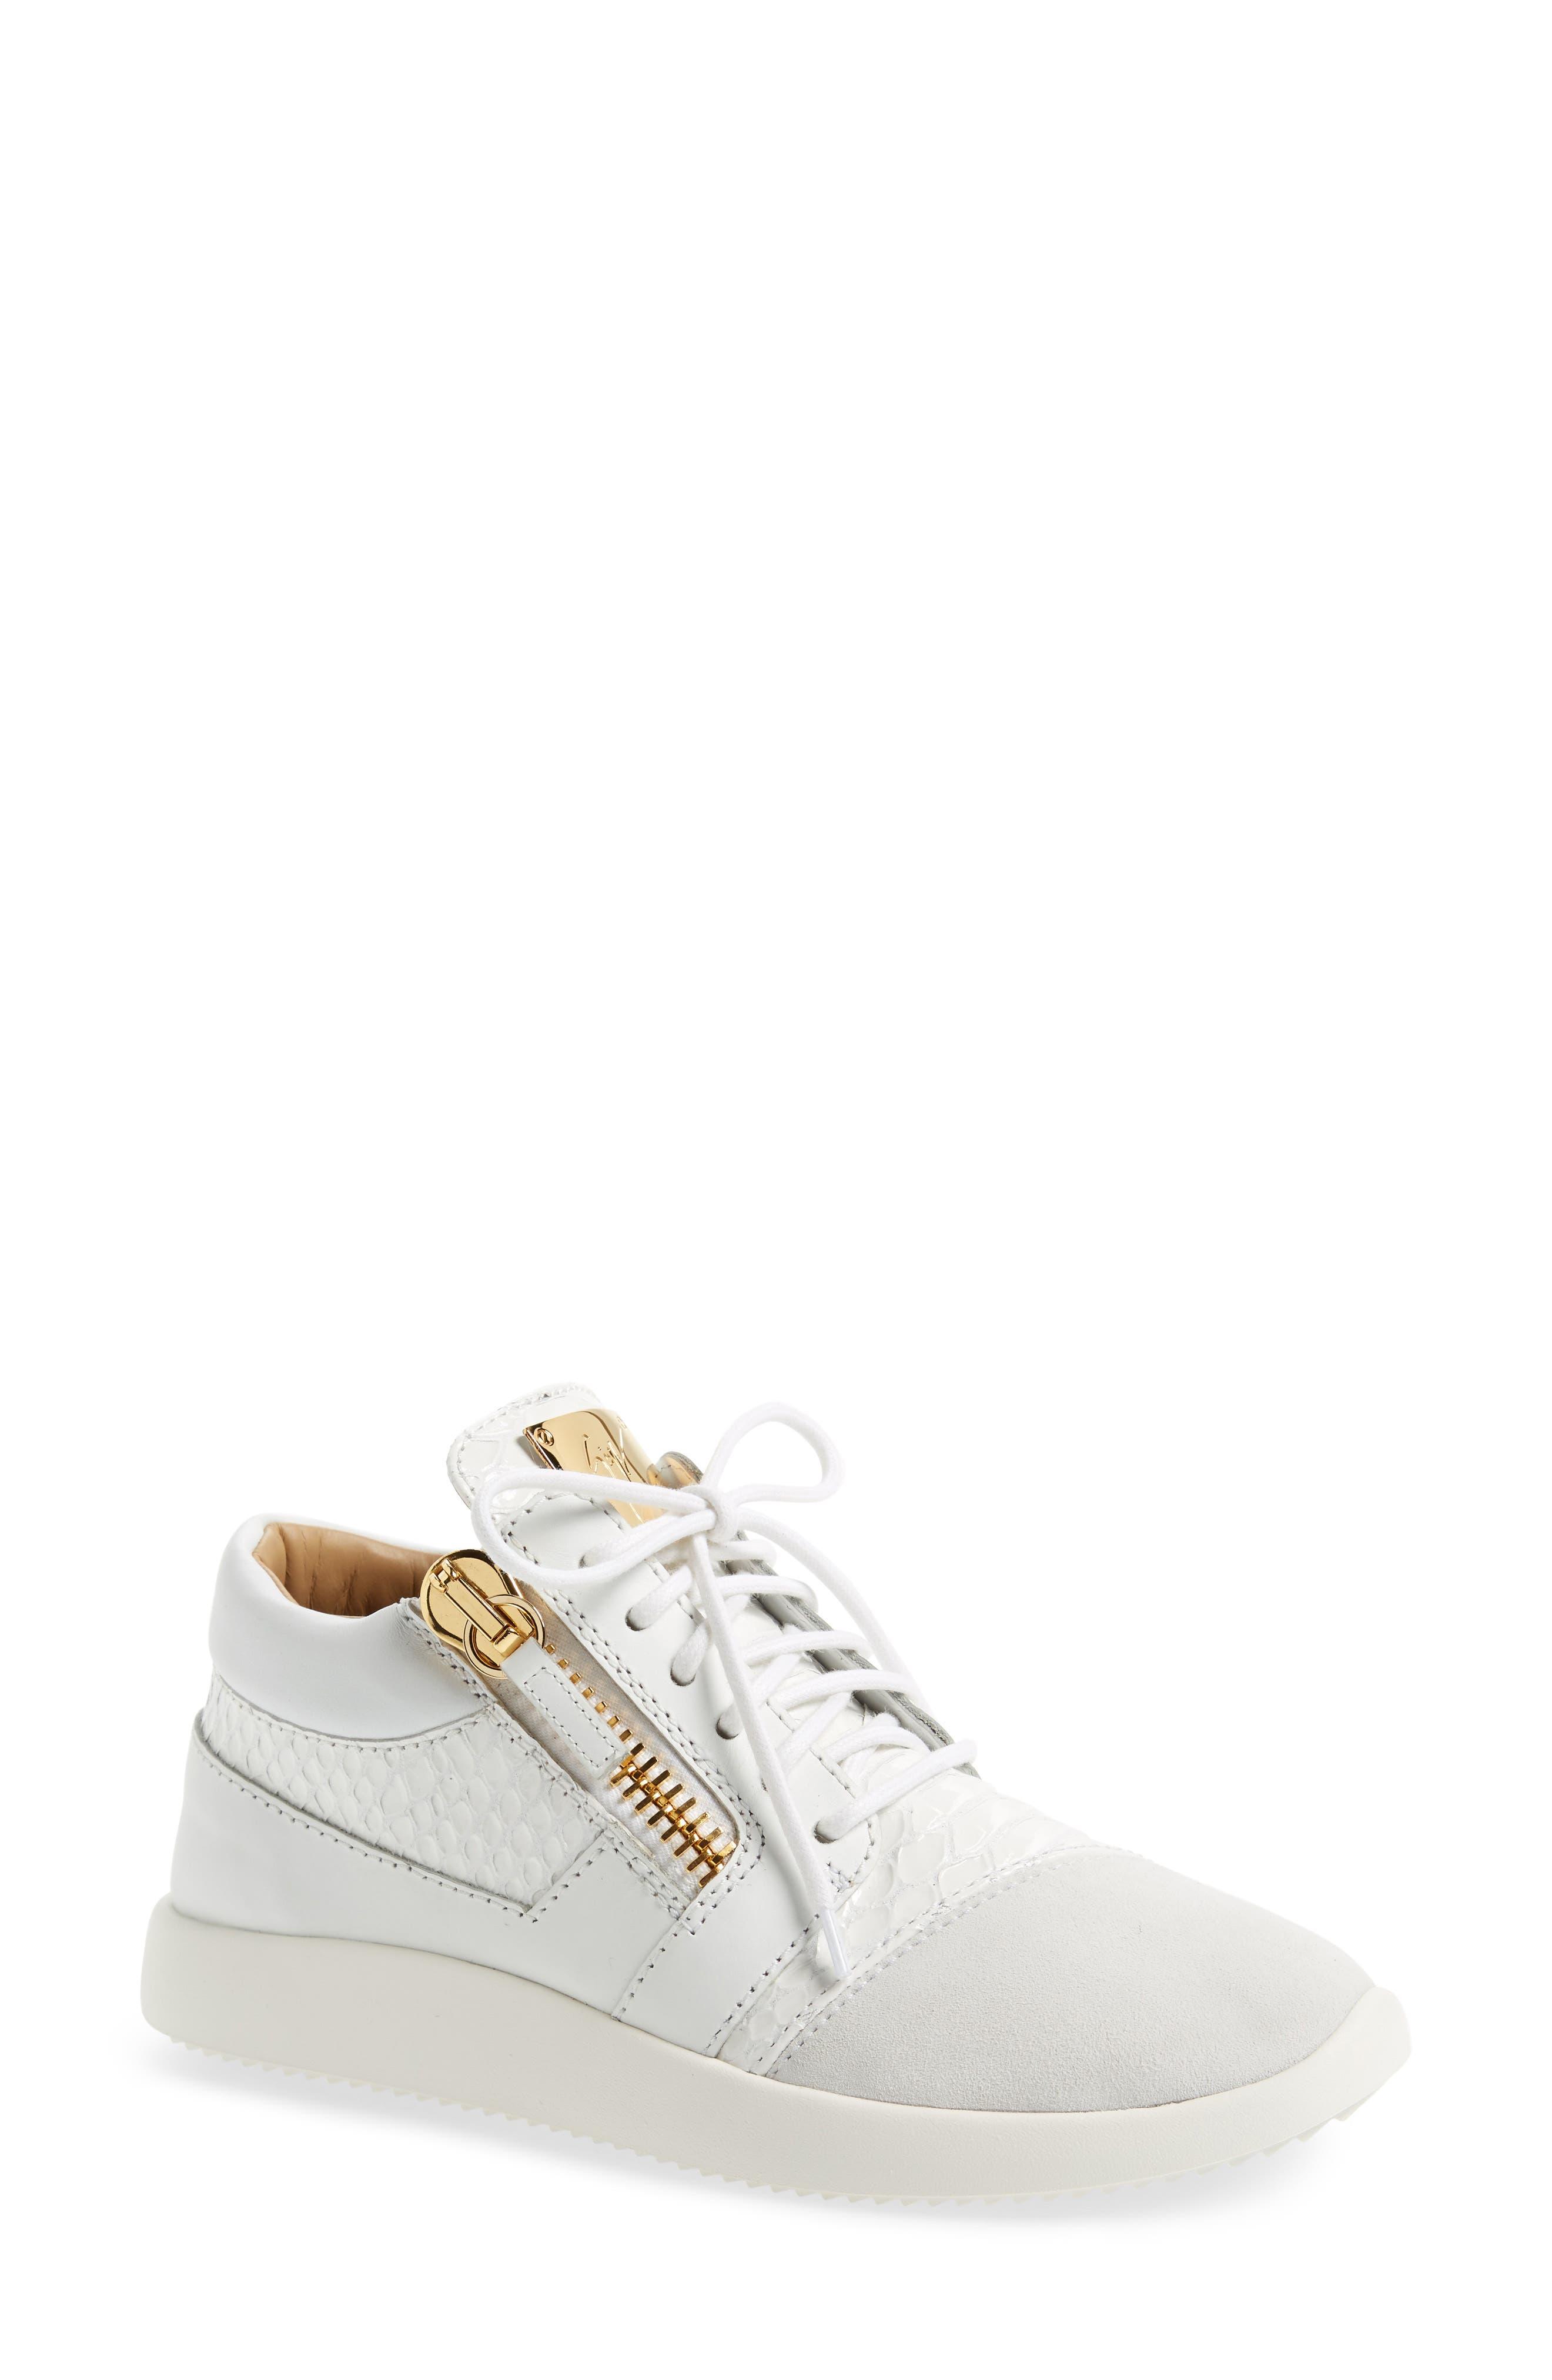 Alternate Image 1 Selected - Giuseppe Zanotti Low Top Sneaker (Women)